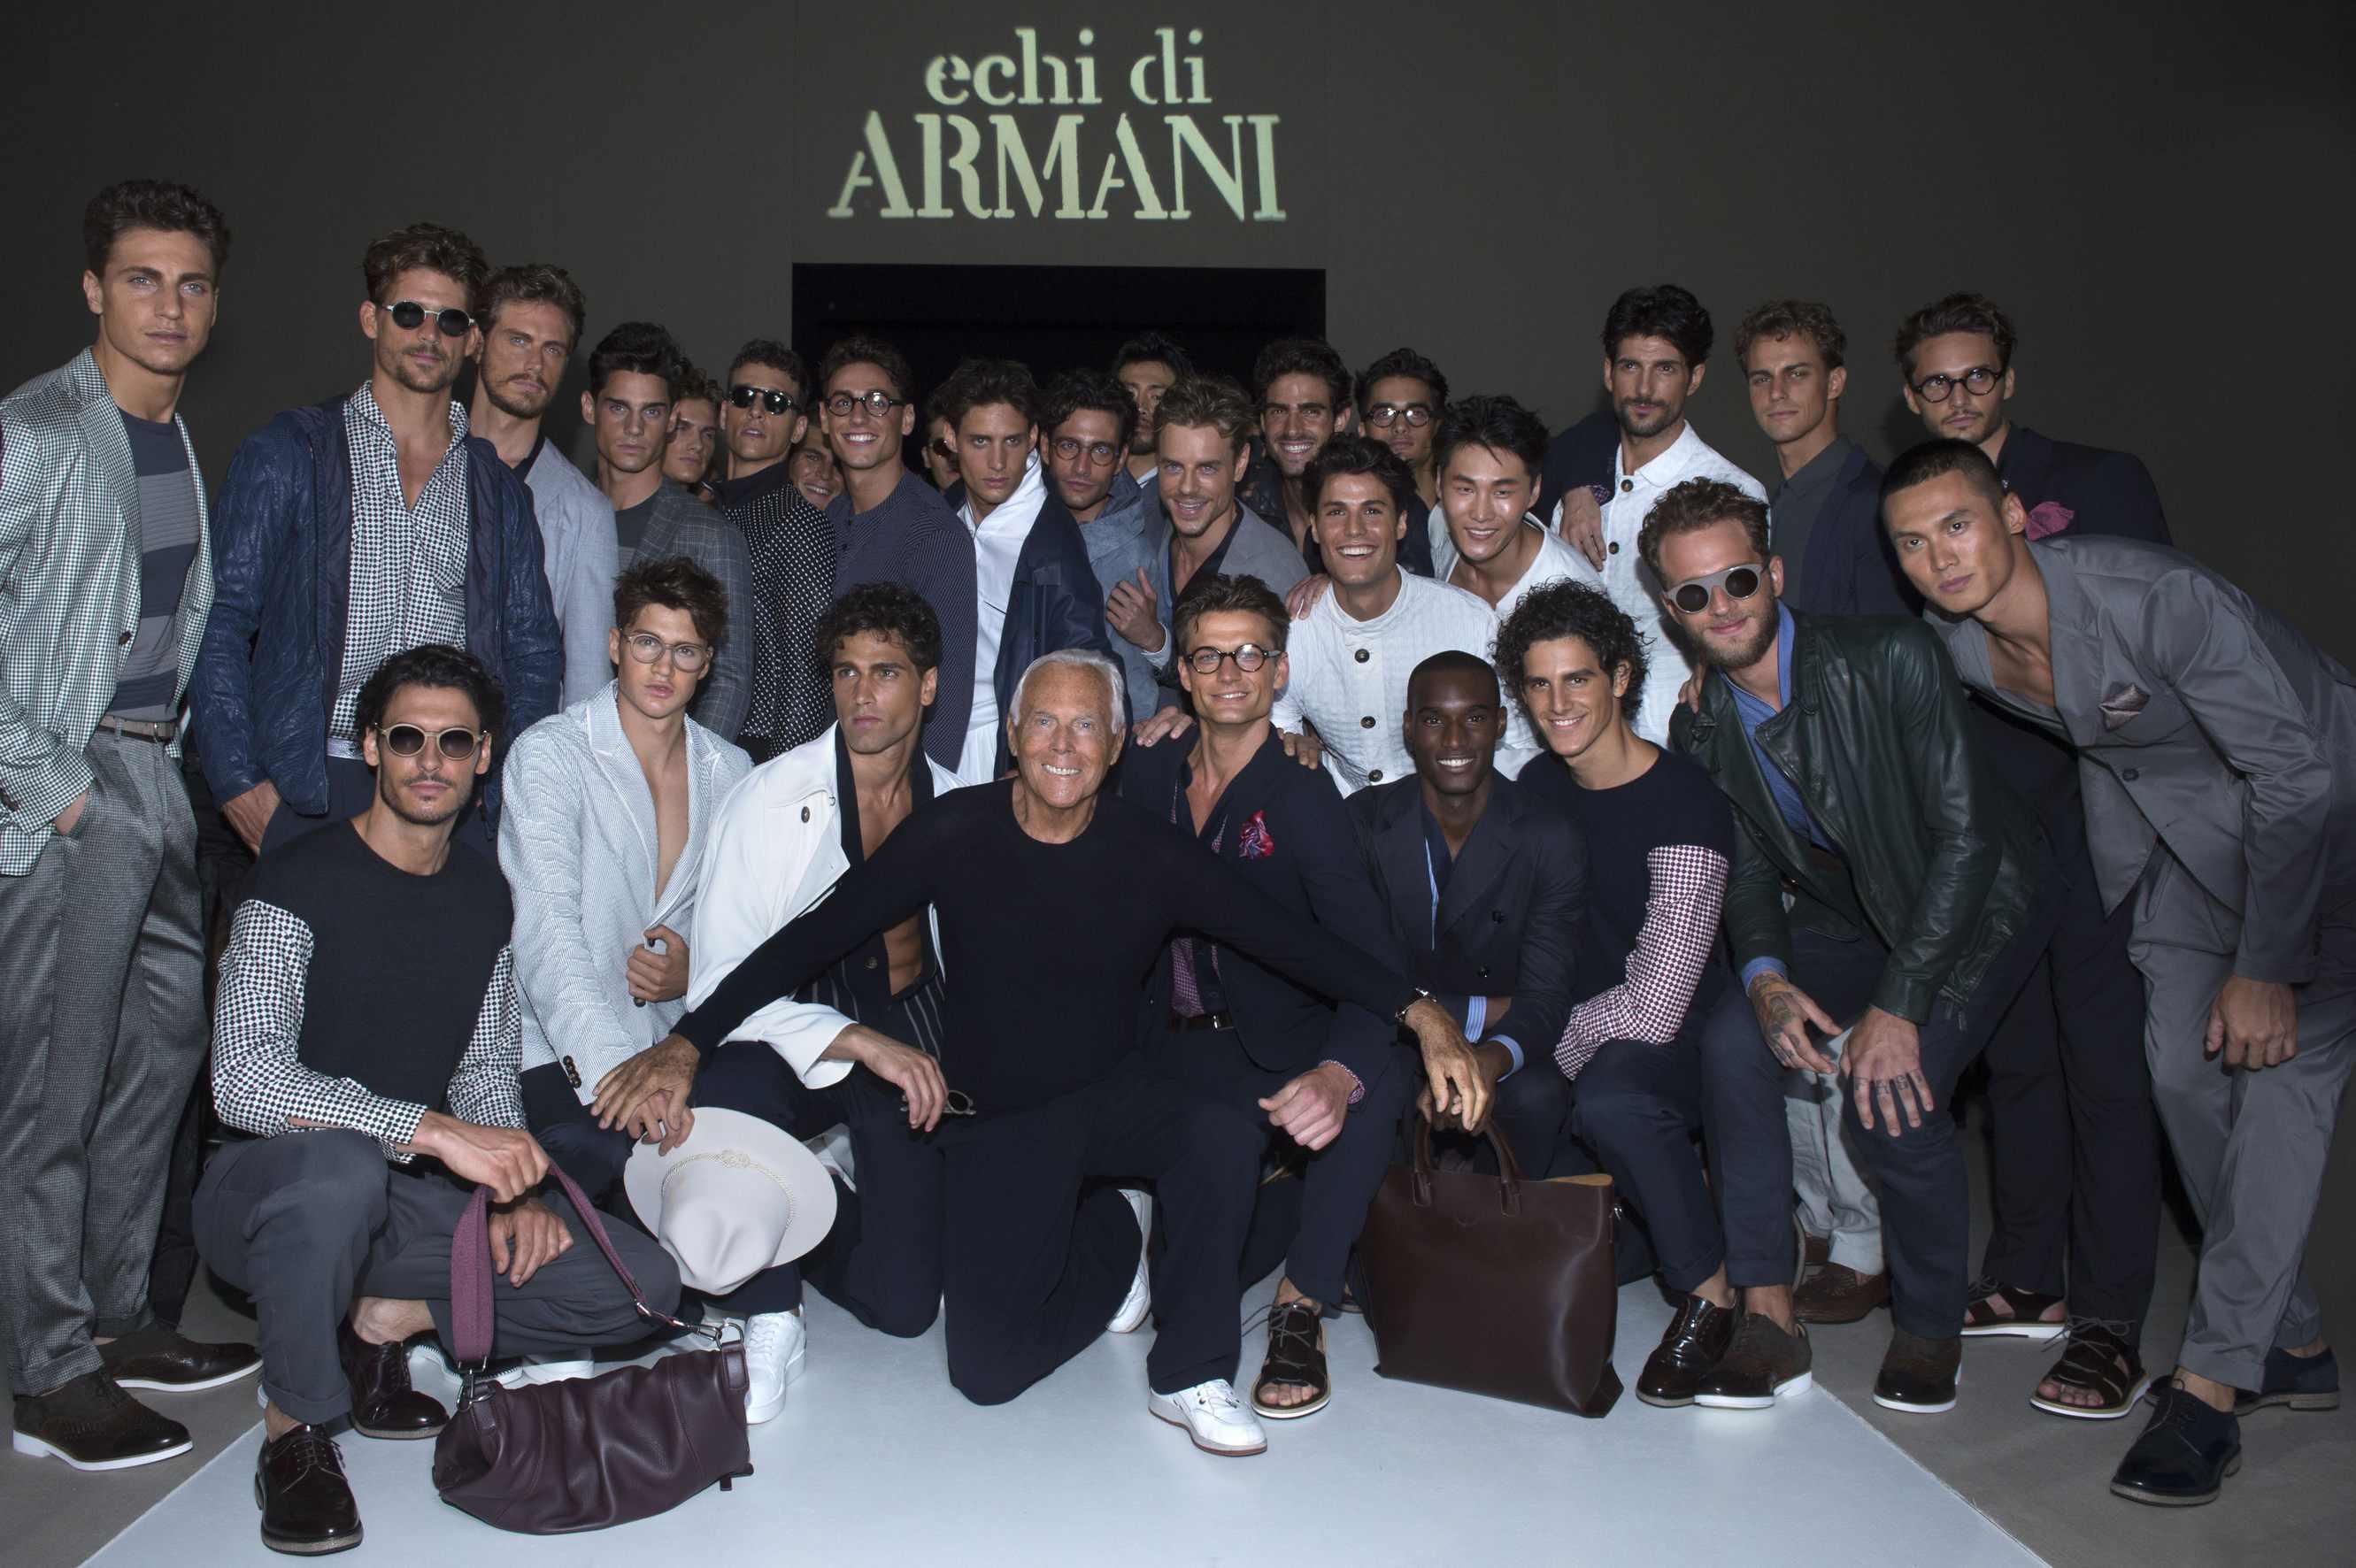 Giorgio Armani and models